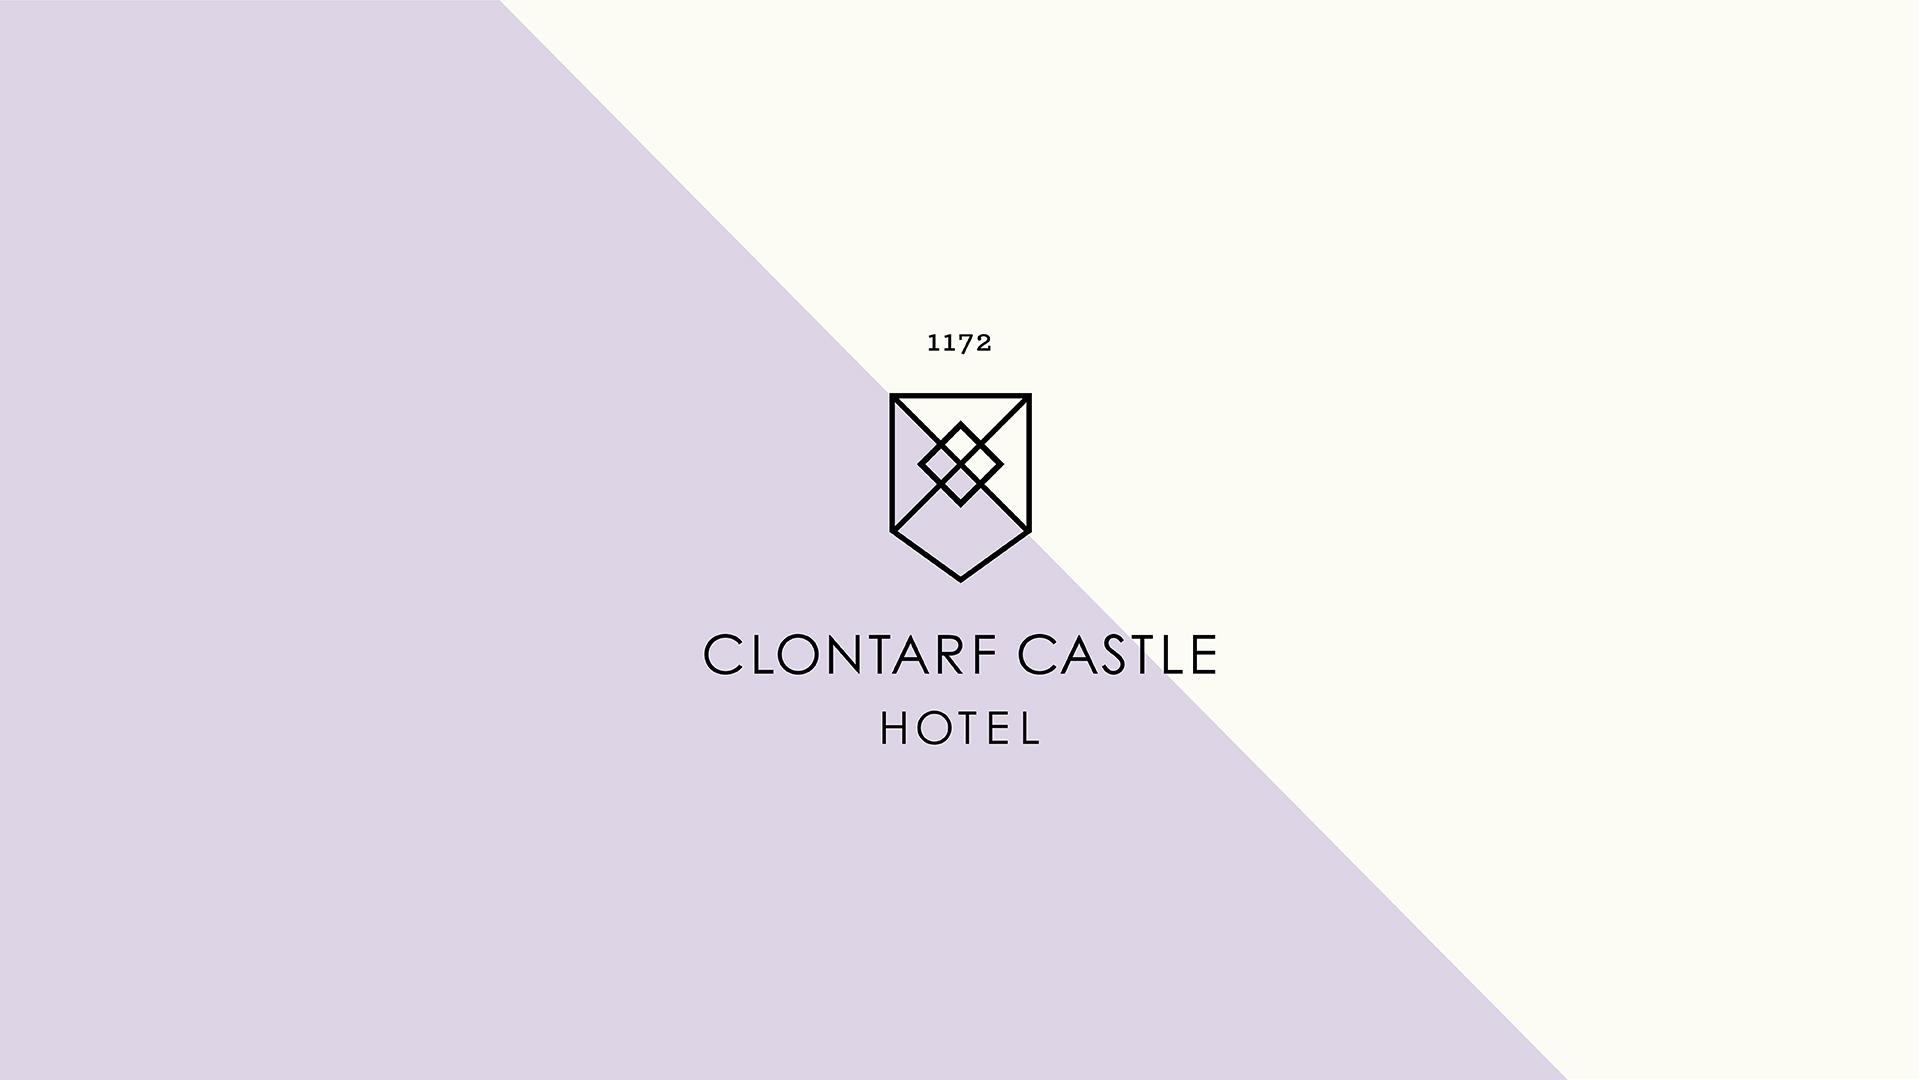 Cover image: Clontarf Castle